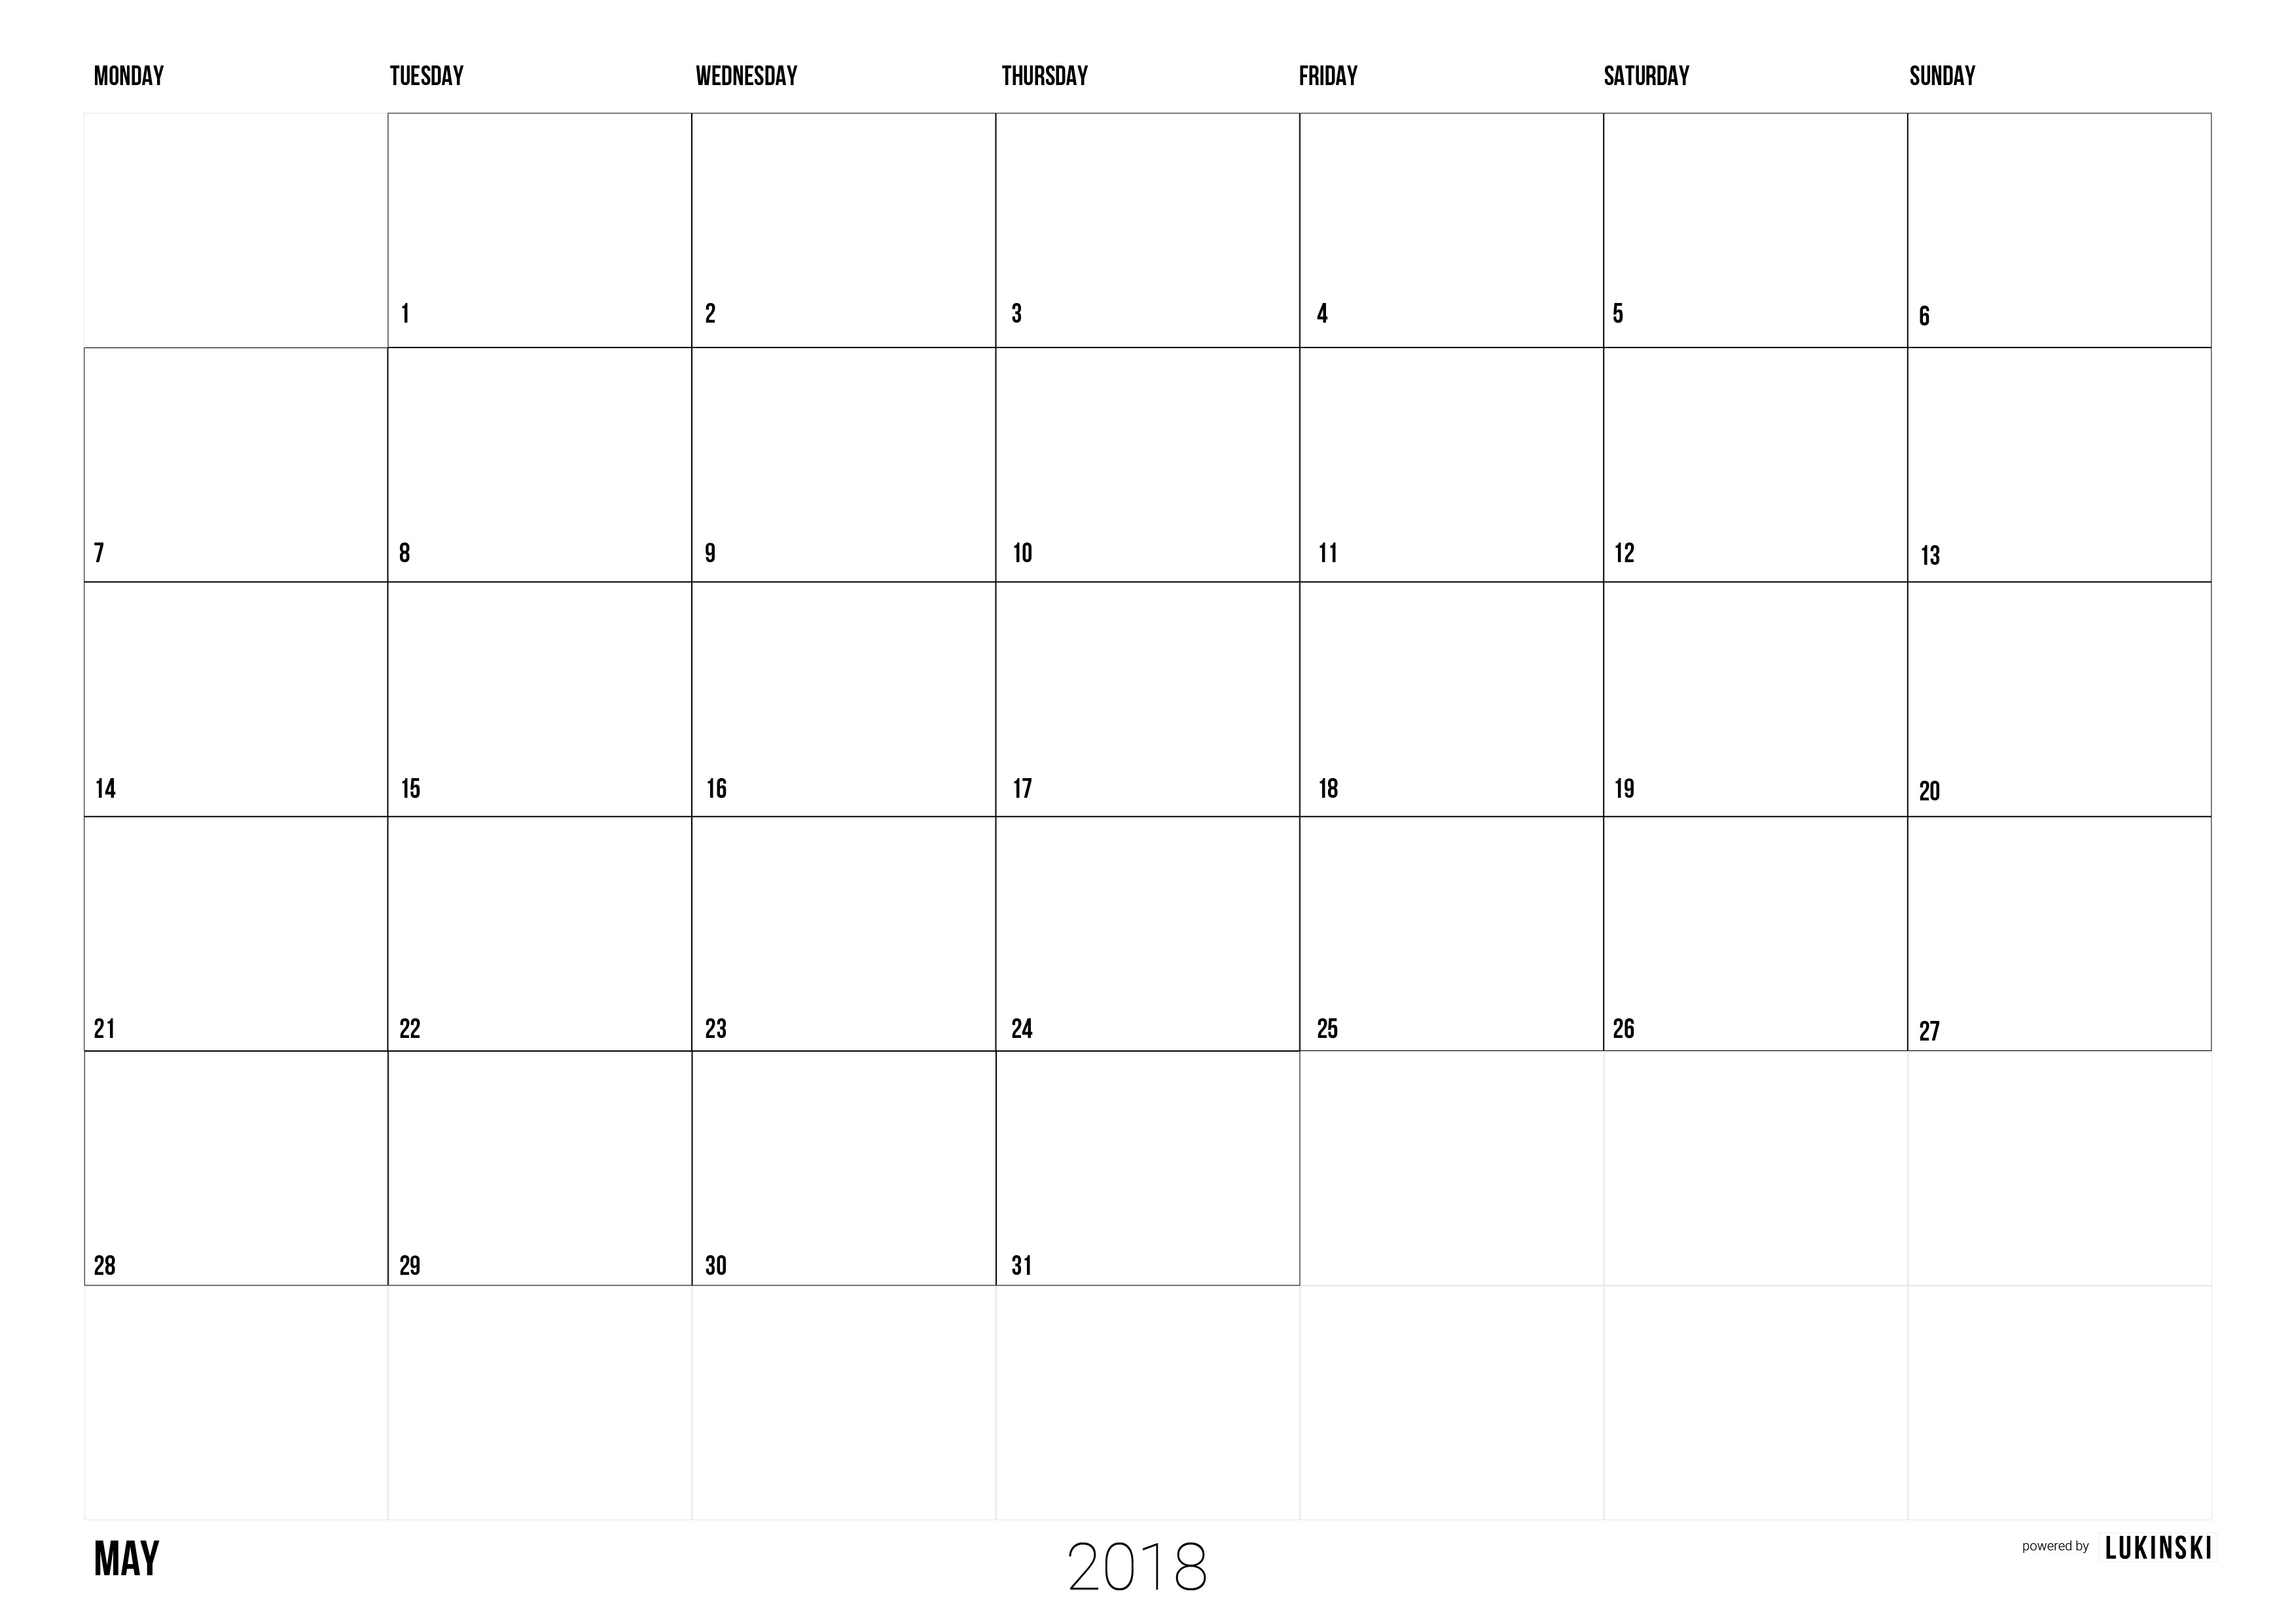 Calendar Ideas For May : Calendar to print pdf monthly calendar free for team and